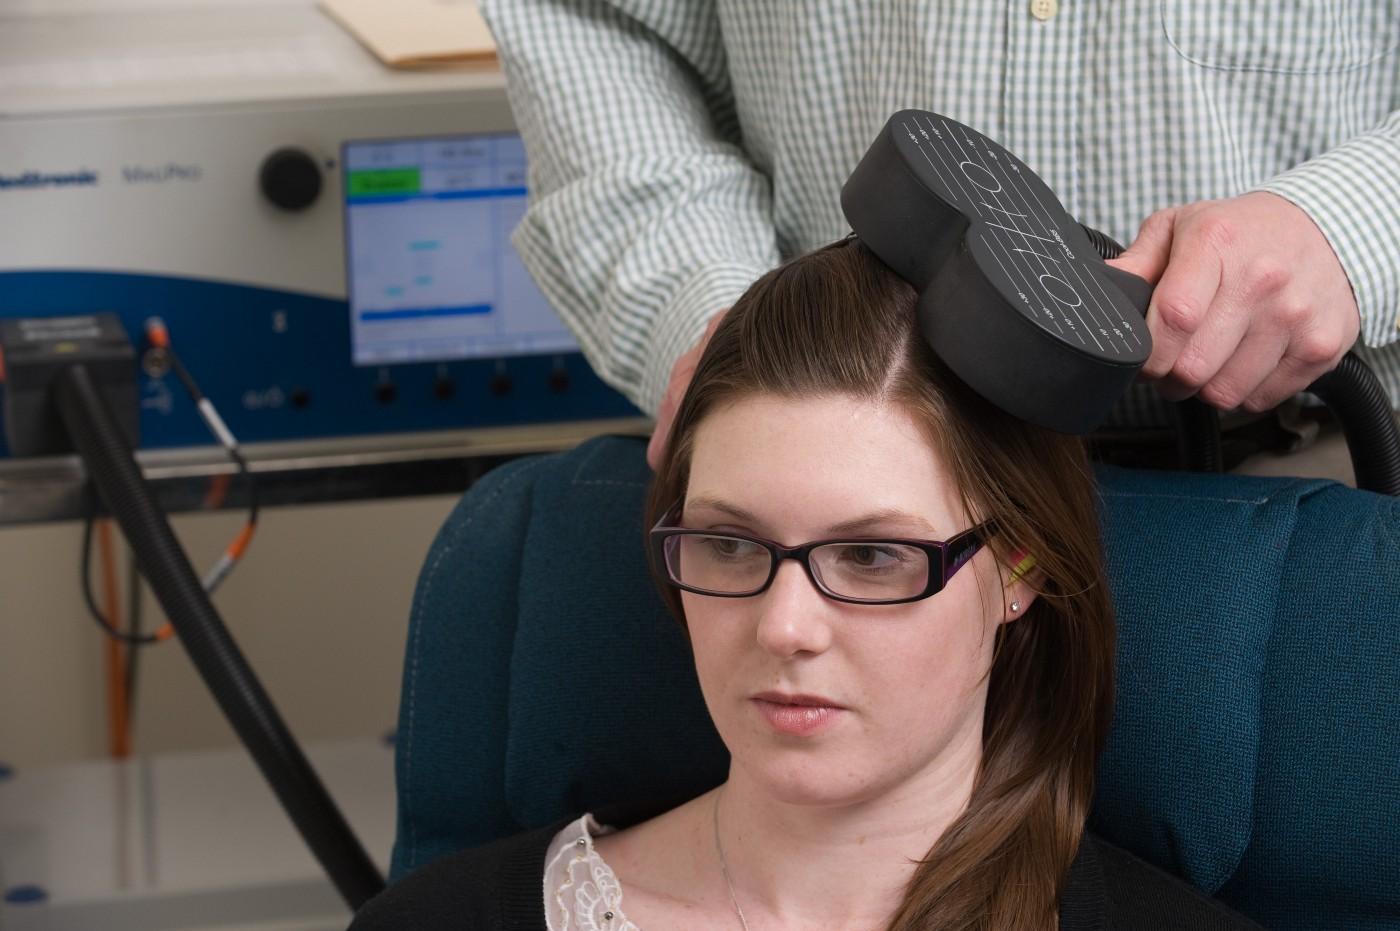 Transcranial Magnetic Stimulation (TMS) in action. (Photo credit: Monash University)